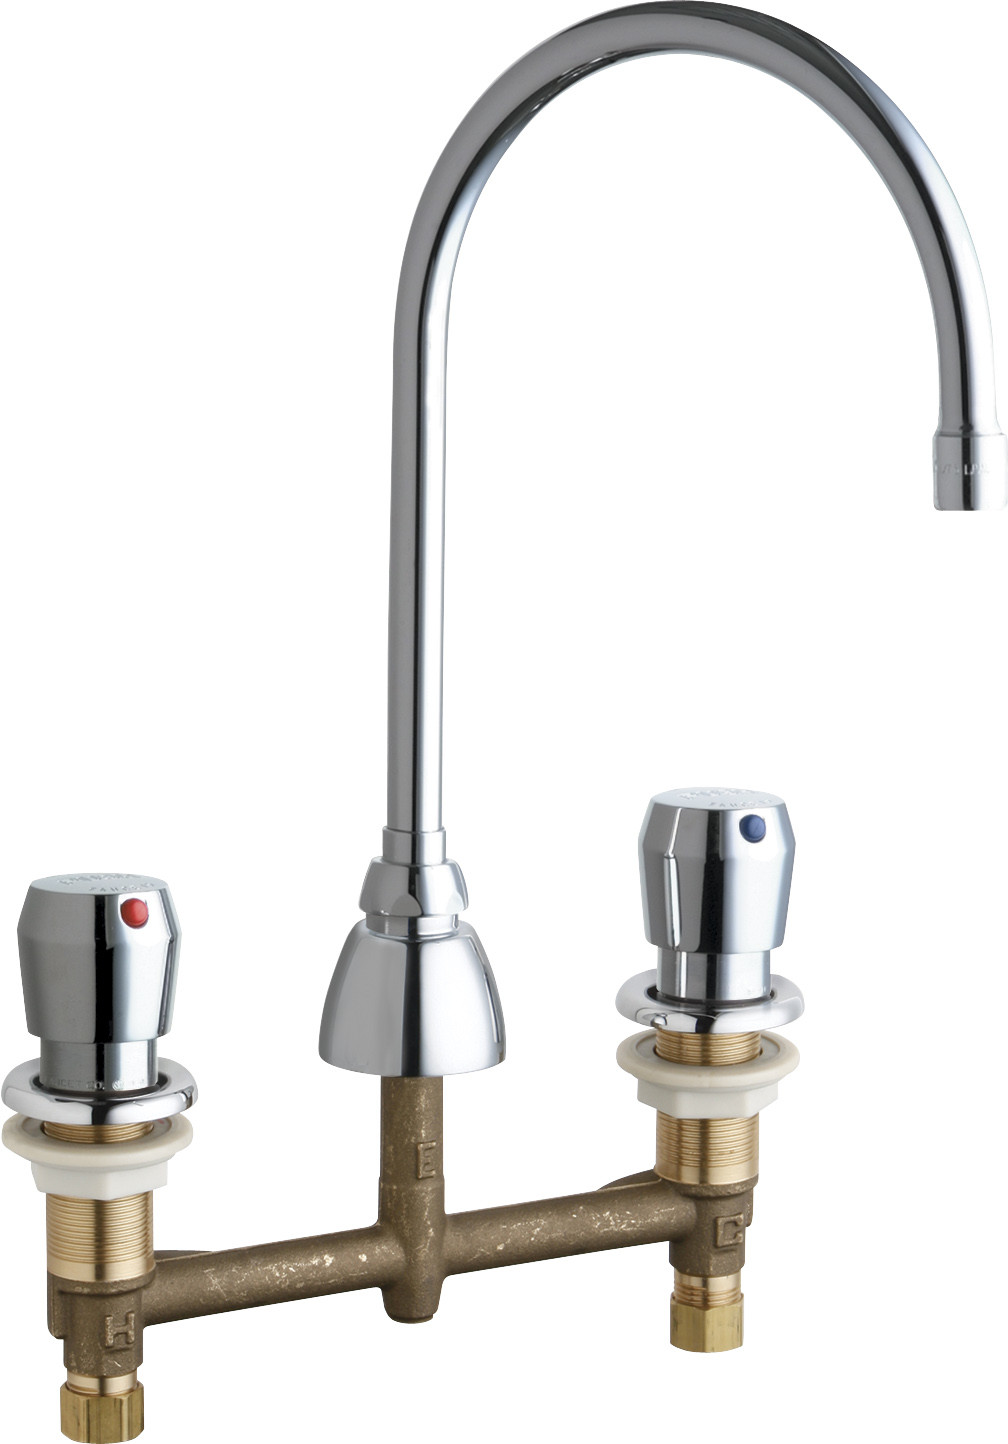 Chicago Faucets 786-E3-665AB Chrome Commercial Grade High Arch Kitchen  Faucet - Walmart.com